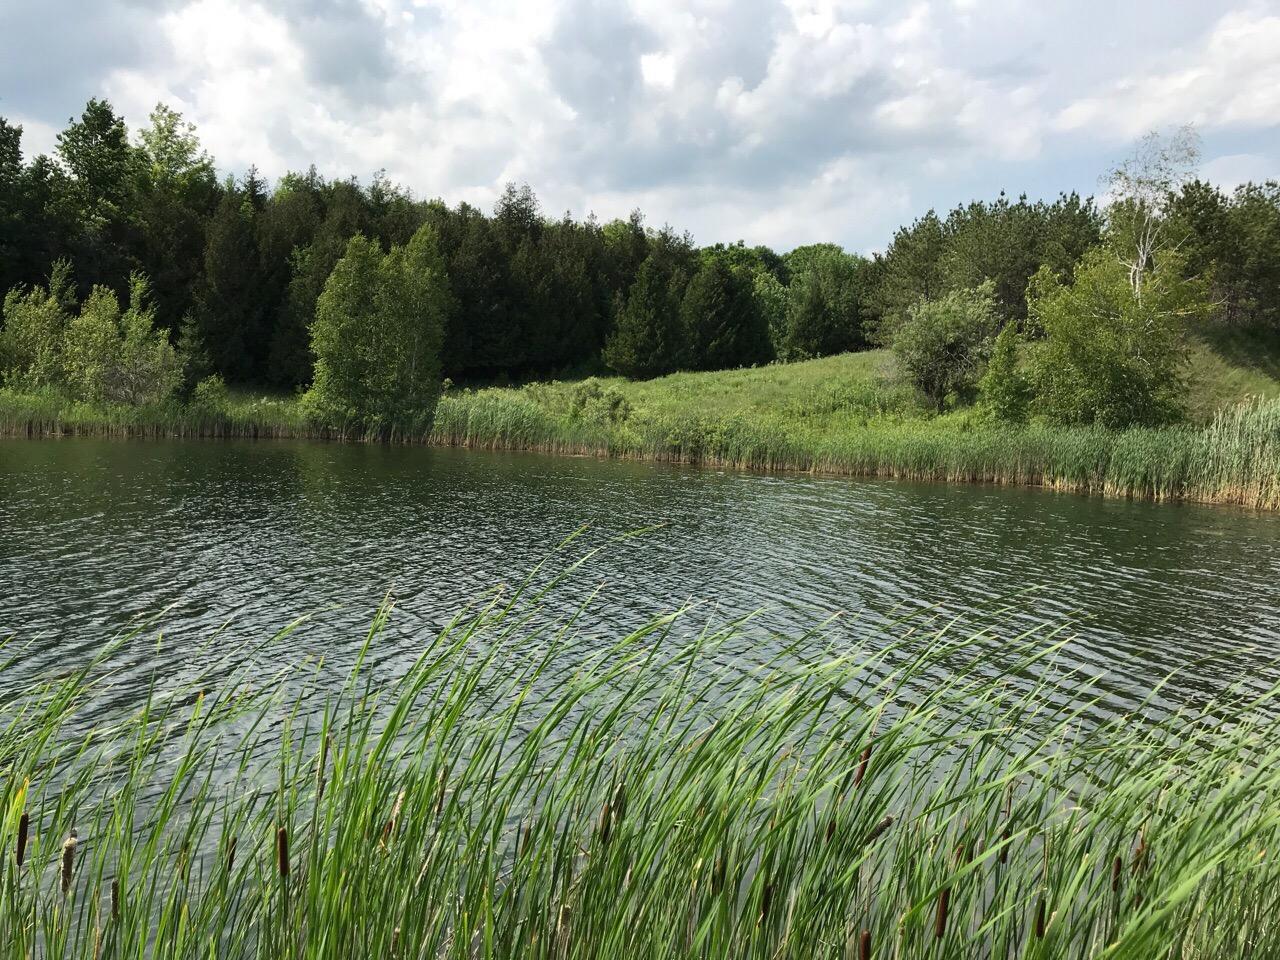 Spray Lake Watersports Park - King Township, ON